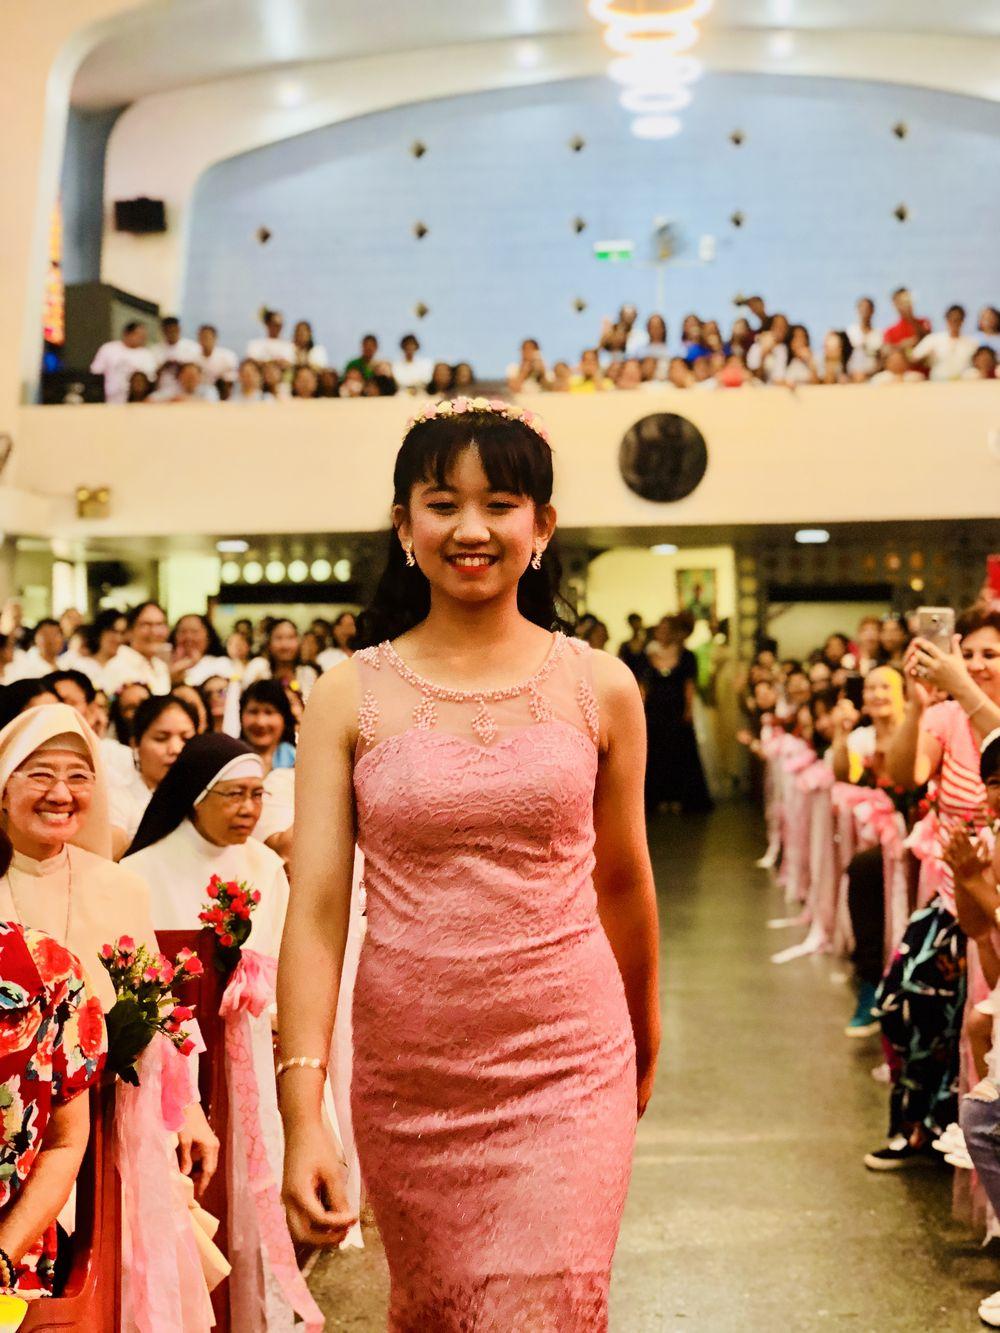 Santacruzan Festival in Taipei